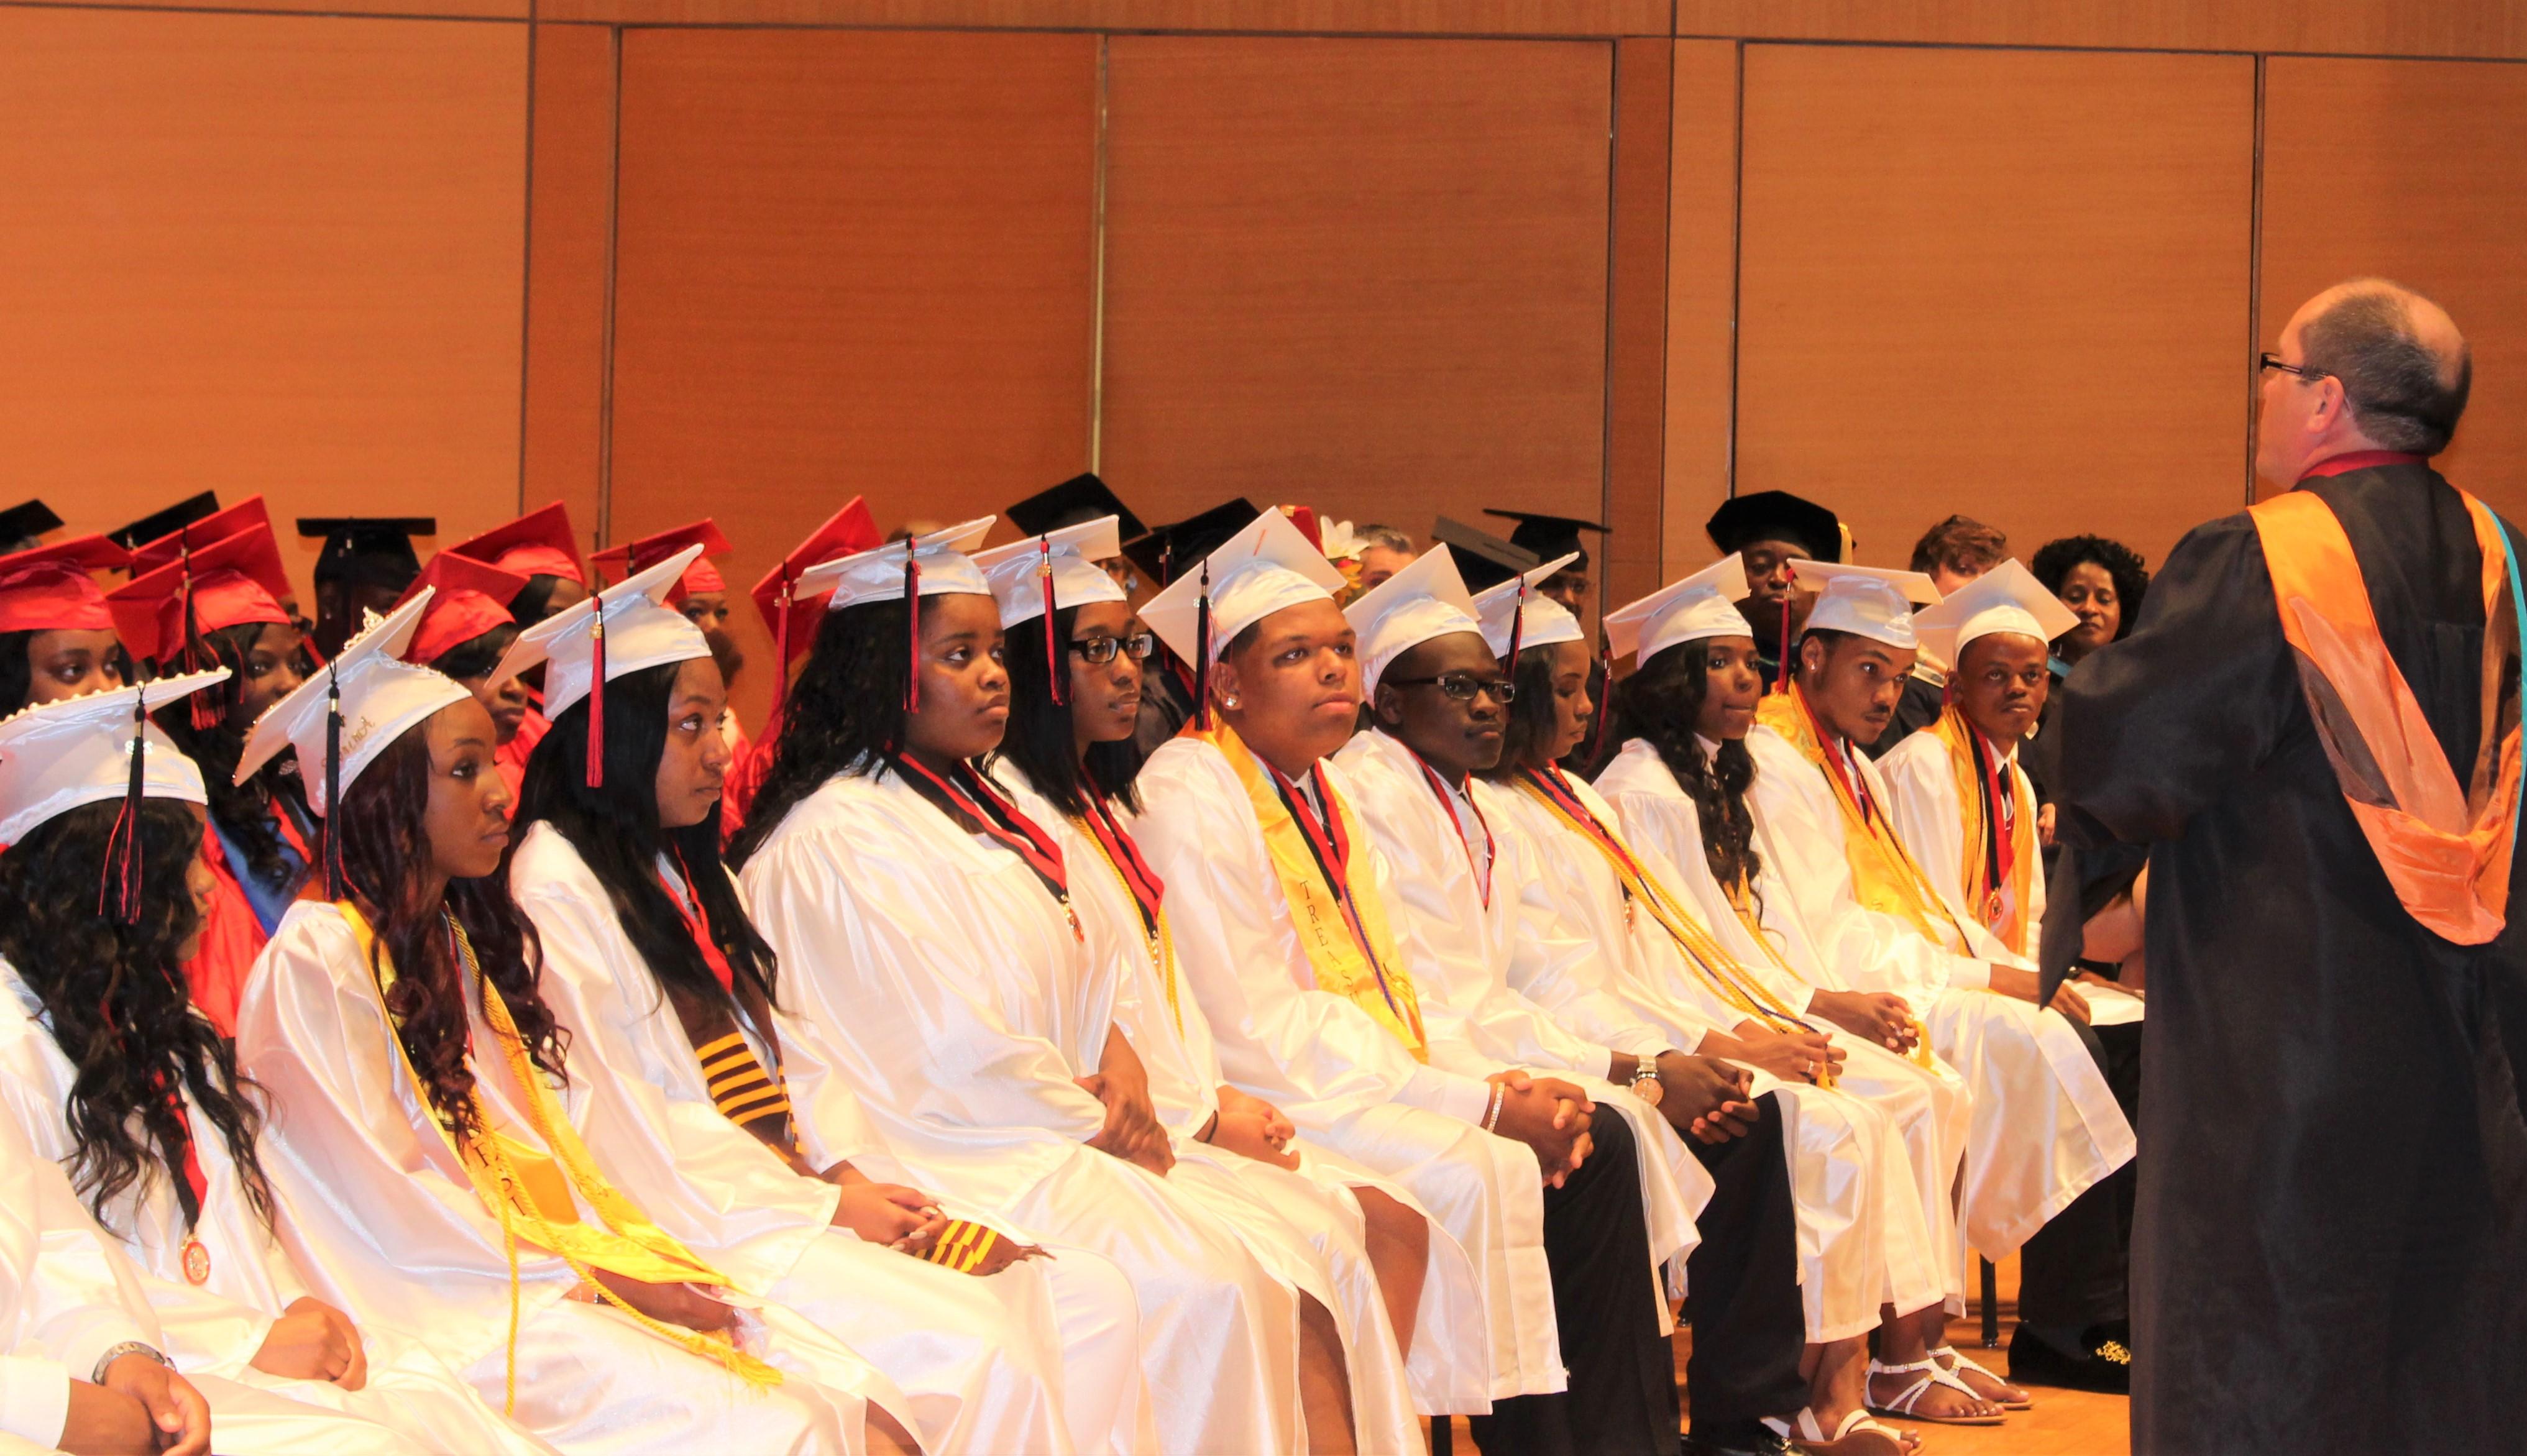 Glenville Holds Graduation At Cleveland State